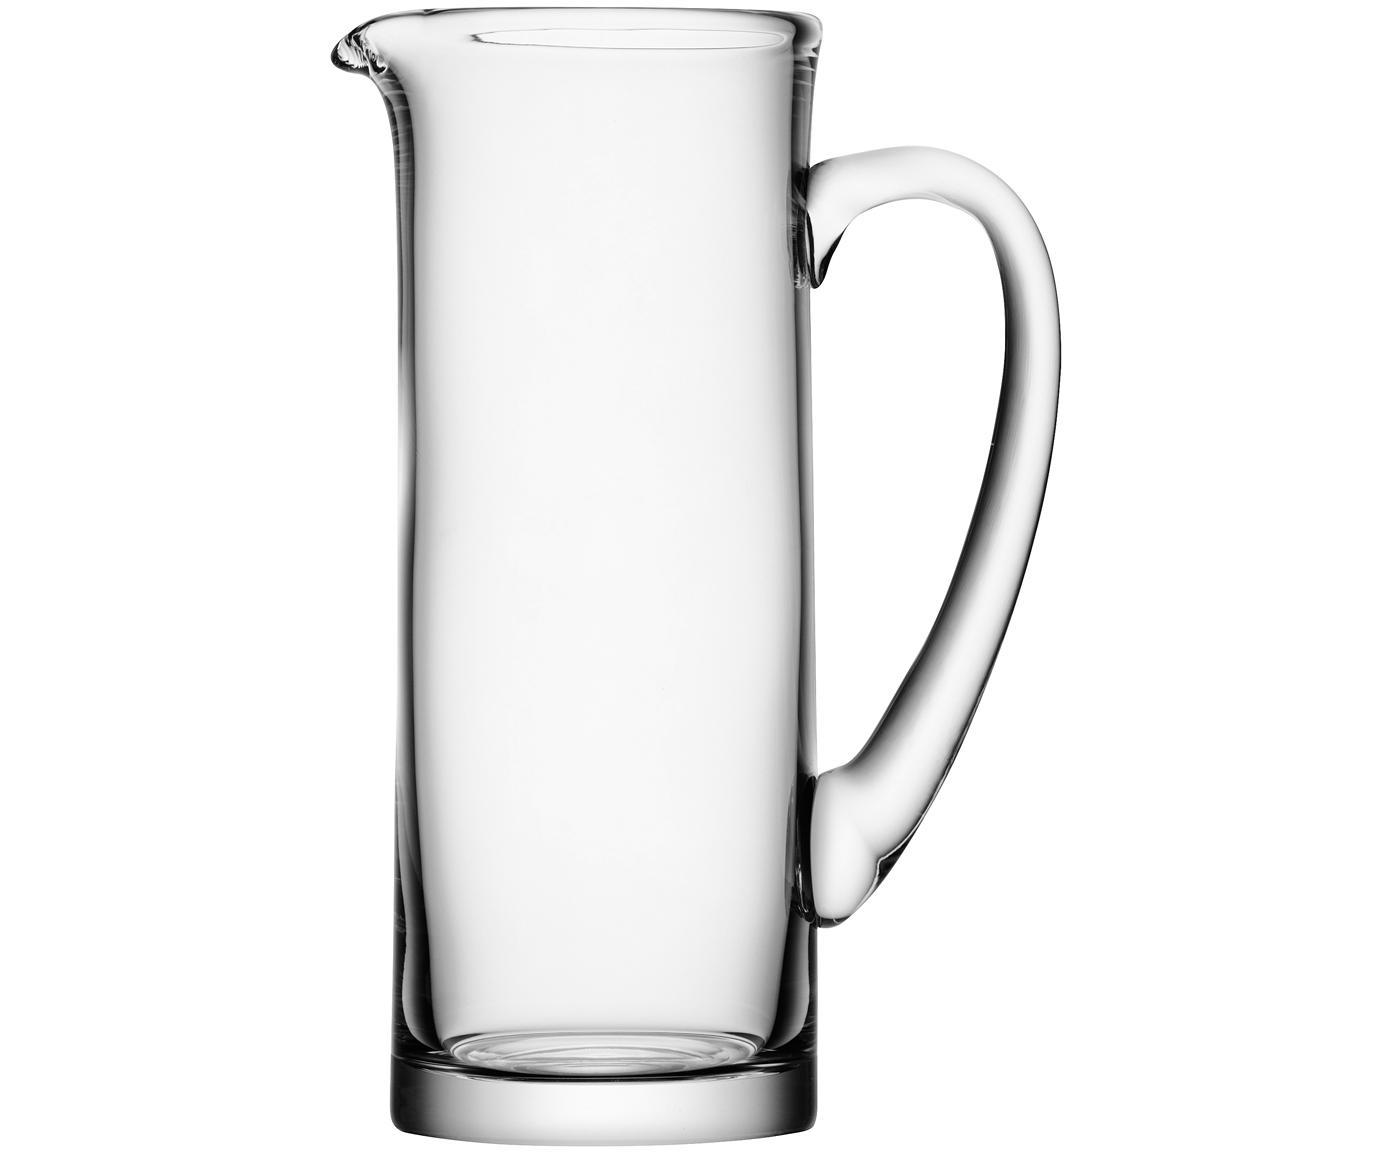 Caraffa Basis, Vetro, Trasparente, 1.5 L